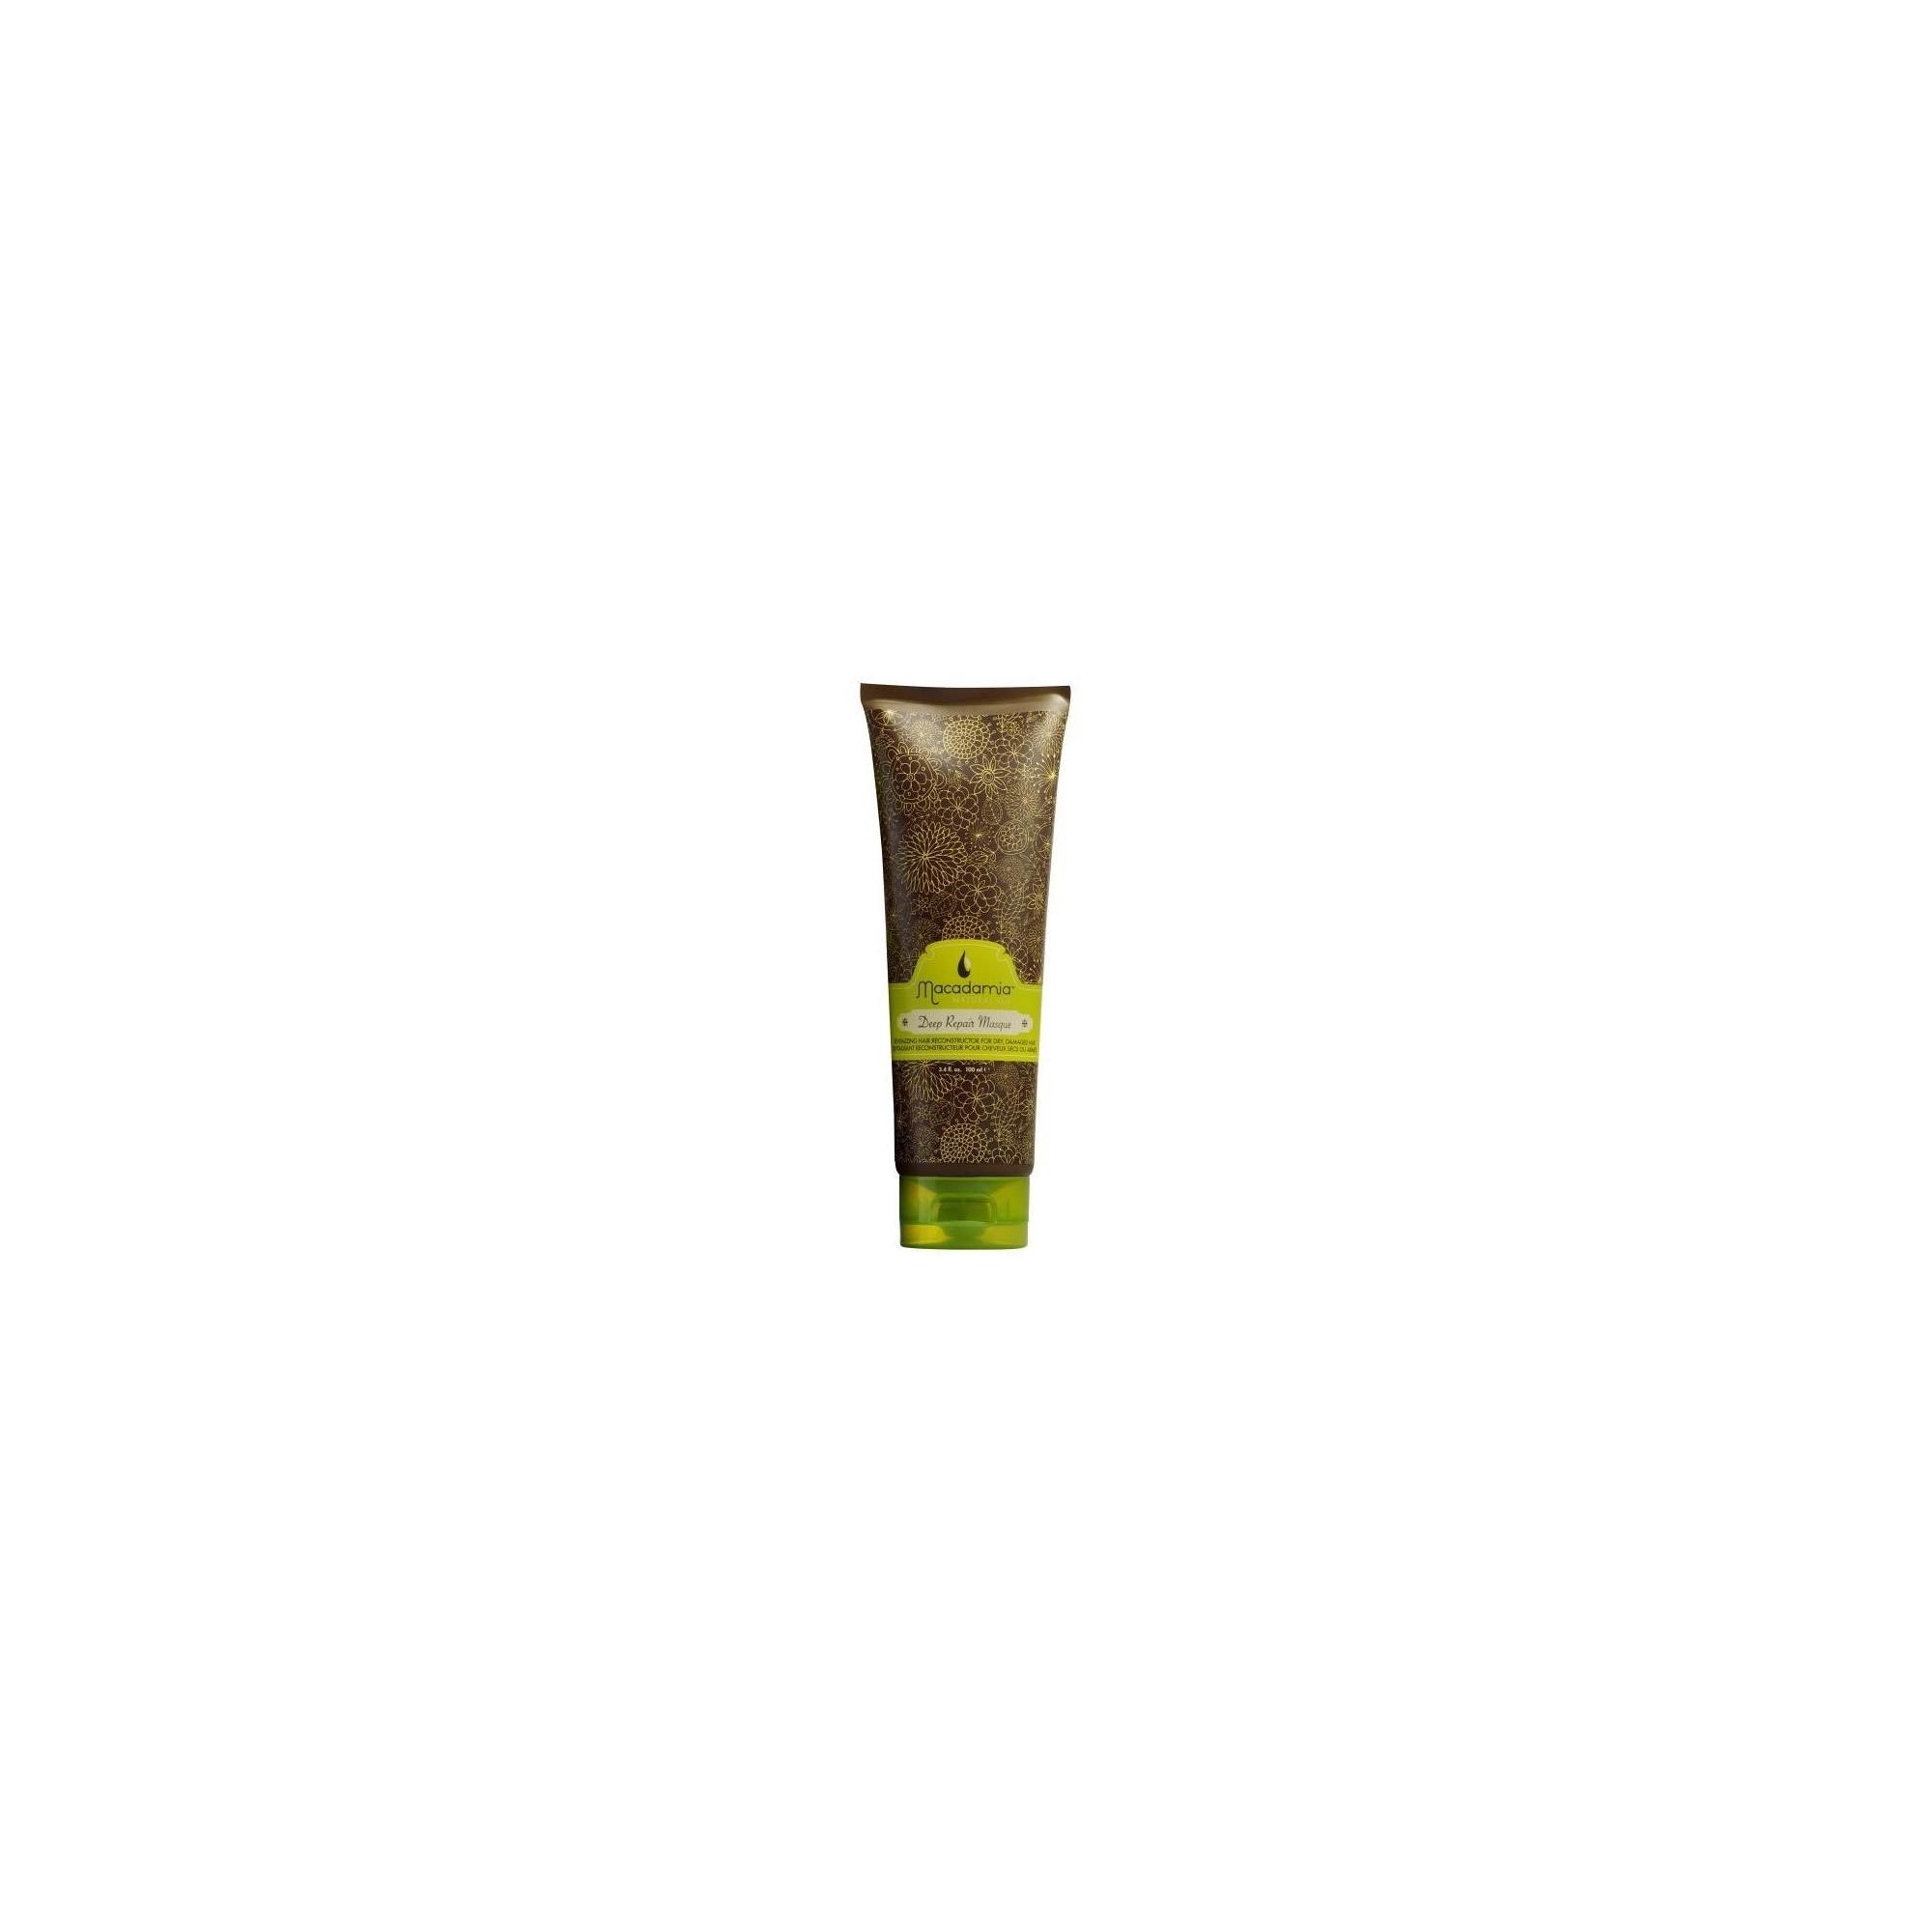 Macadamia Natural Oil Deep Repair Masque 100ml